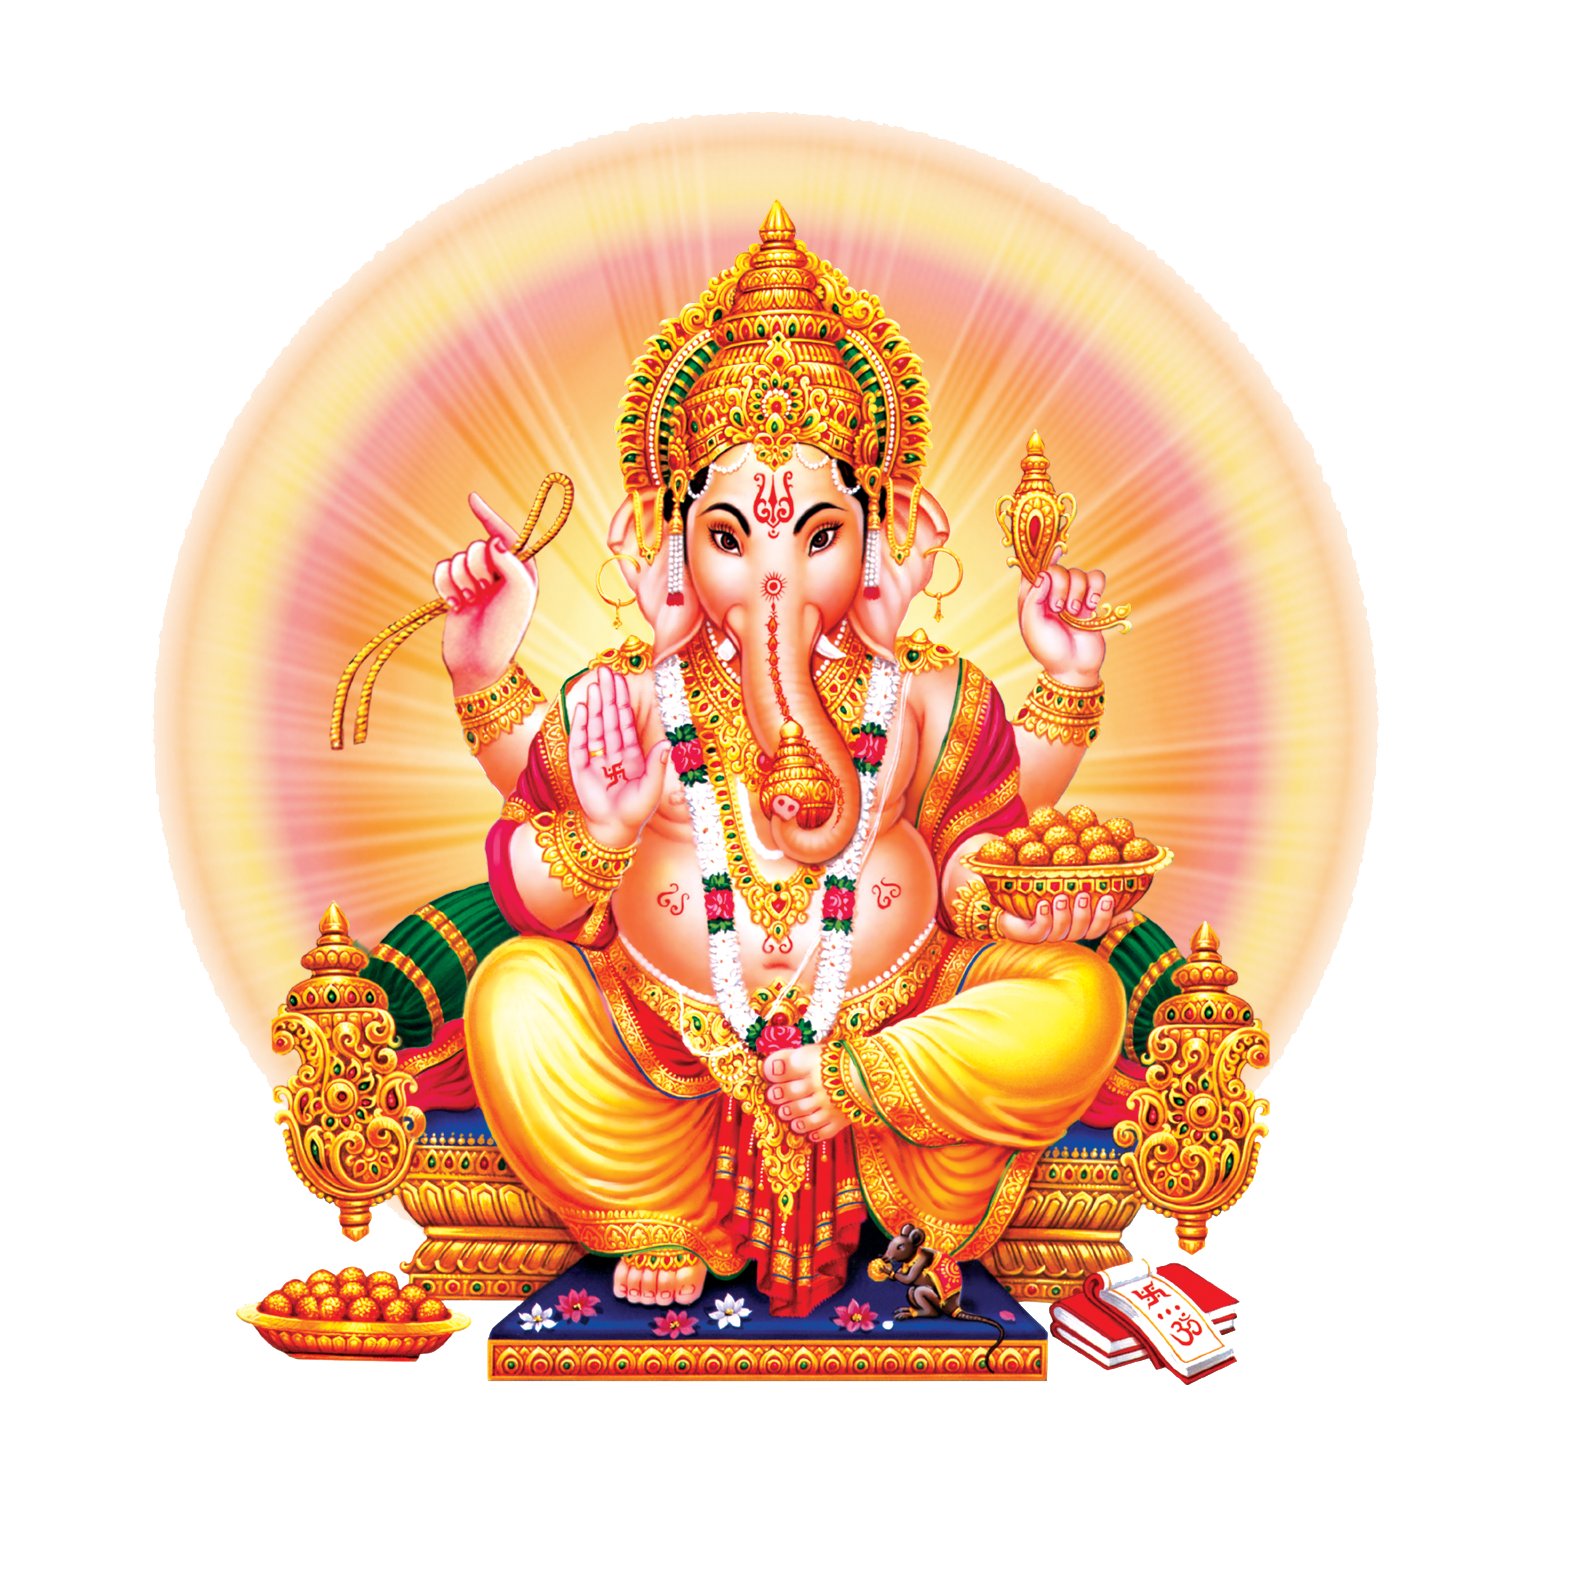 Sri Ganesh Png PNG Image - God HD PNG